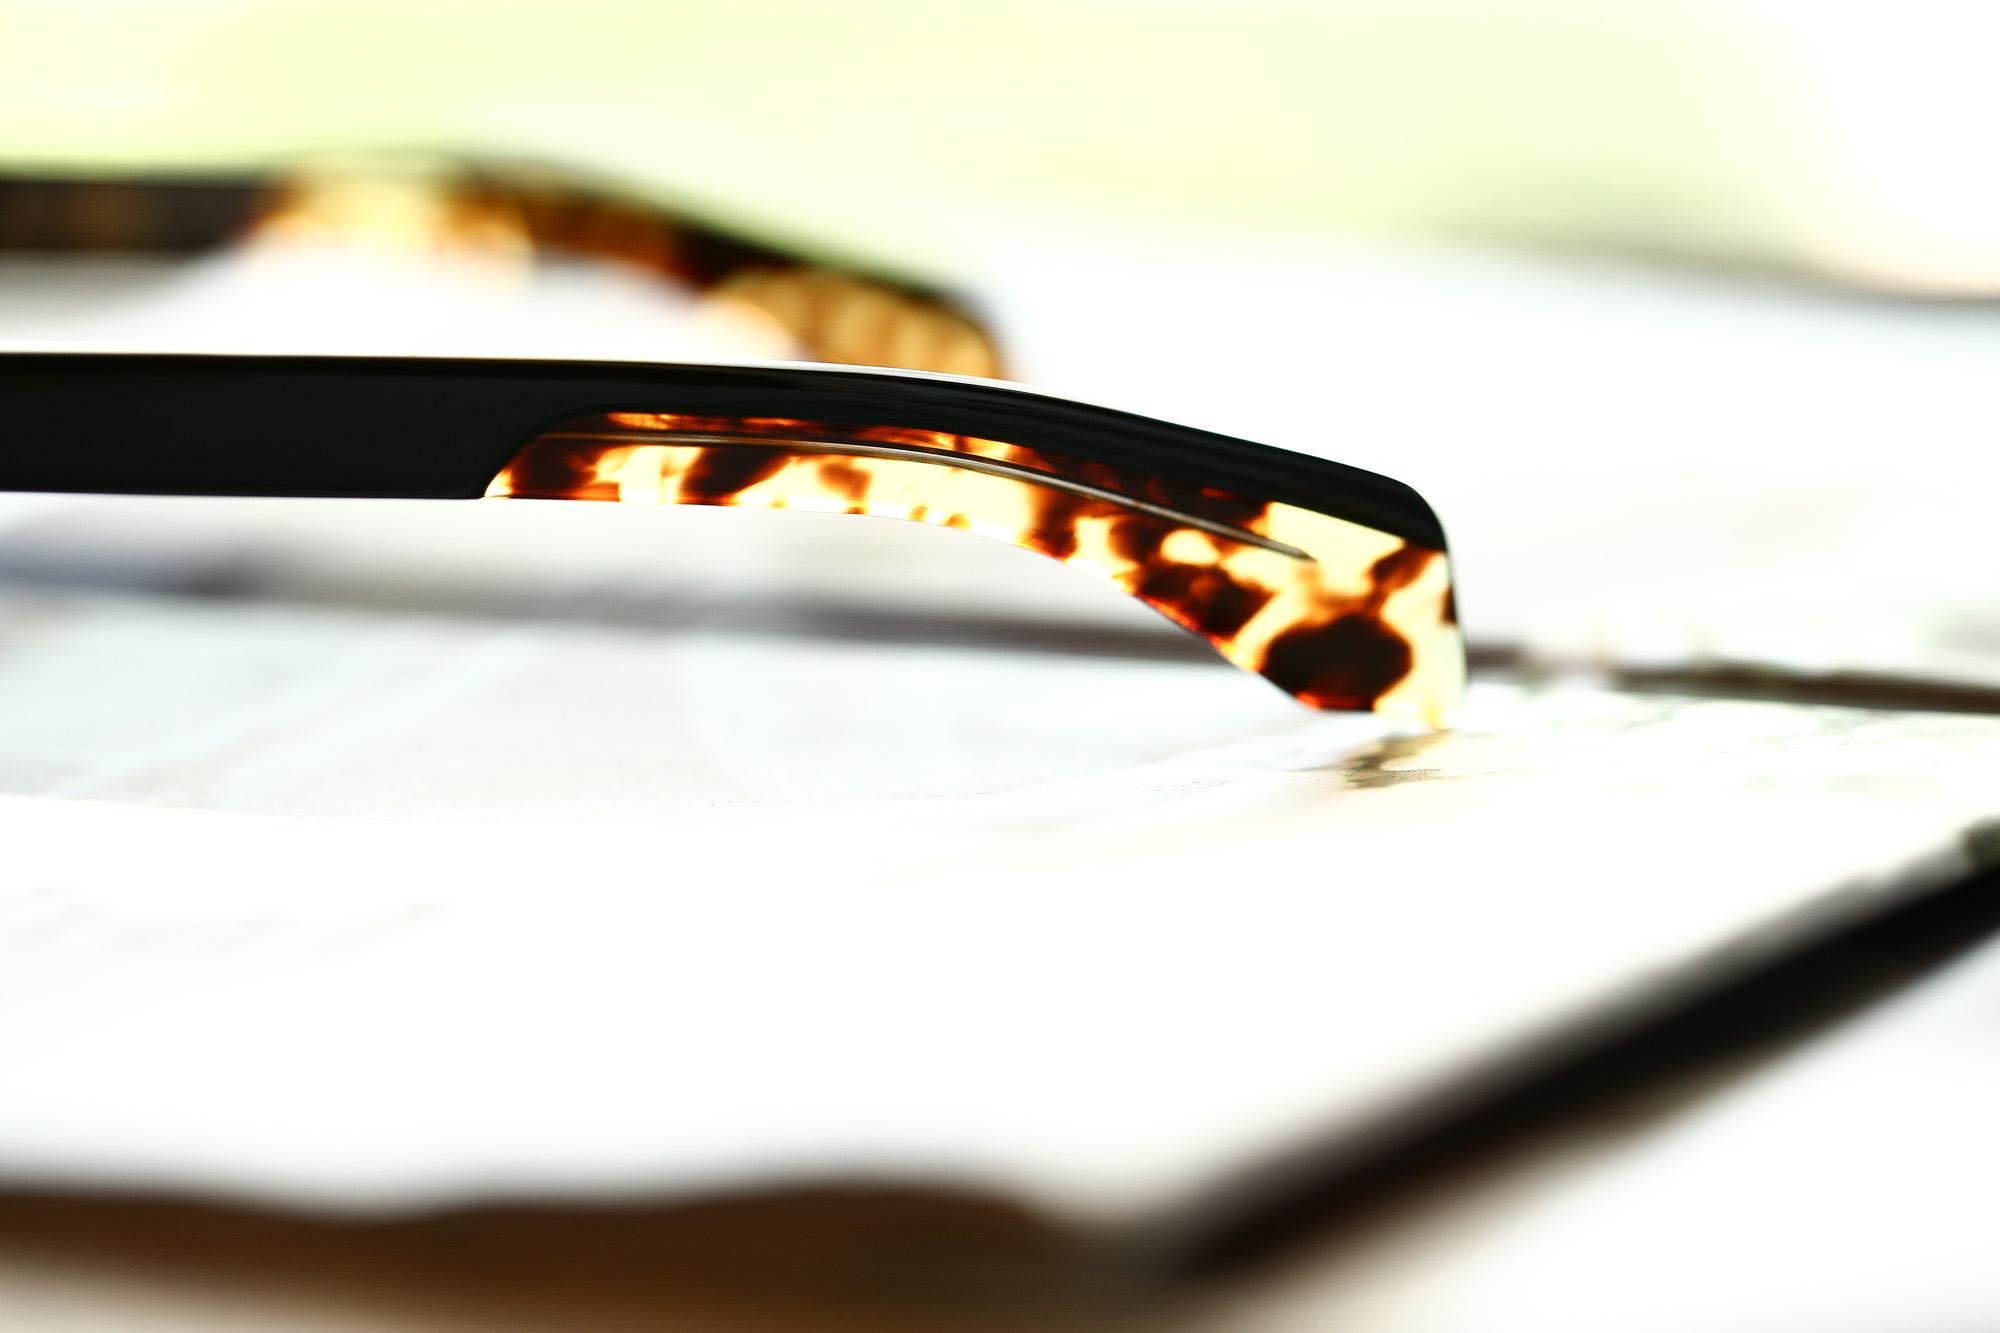 JACQUESMARIEMAGE(ジャックマリーマージュ) STENDHAL(スタンダール) STERLING SILVER スターリングシルバー アセテートフレーム  ラウンド型 アイウェア サングラス NOIR(ノワール) HANDCRAFTED IN JAPAN(日本製) 2018 秋冬新作 jacquesmariemage 愛知 名古屋 ZODIAC ゾディアック